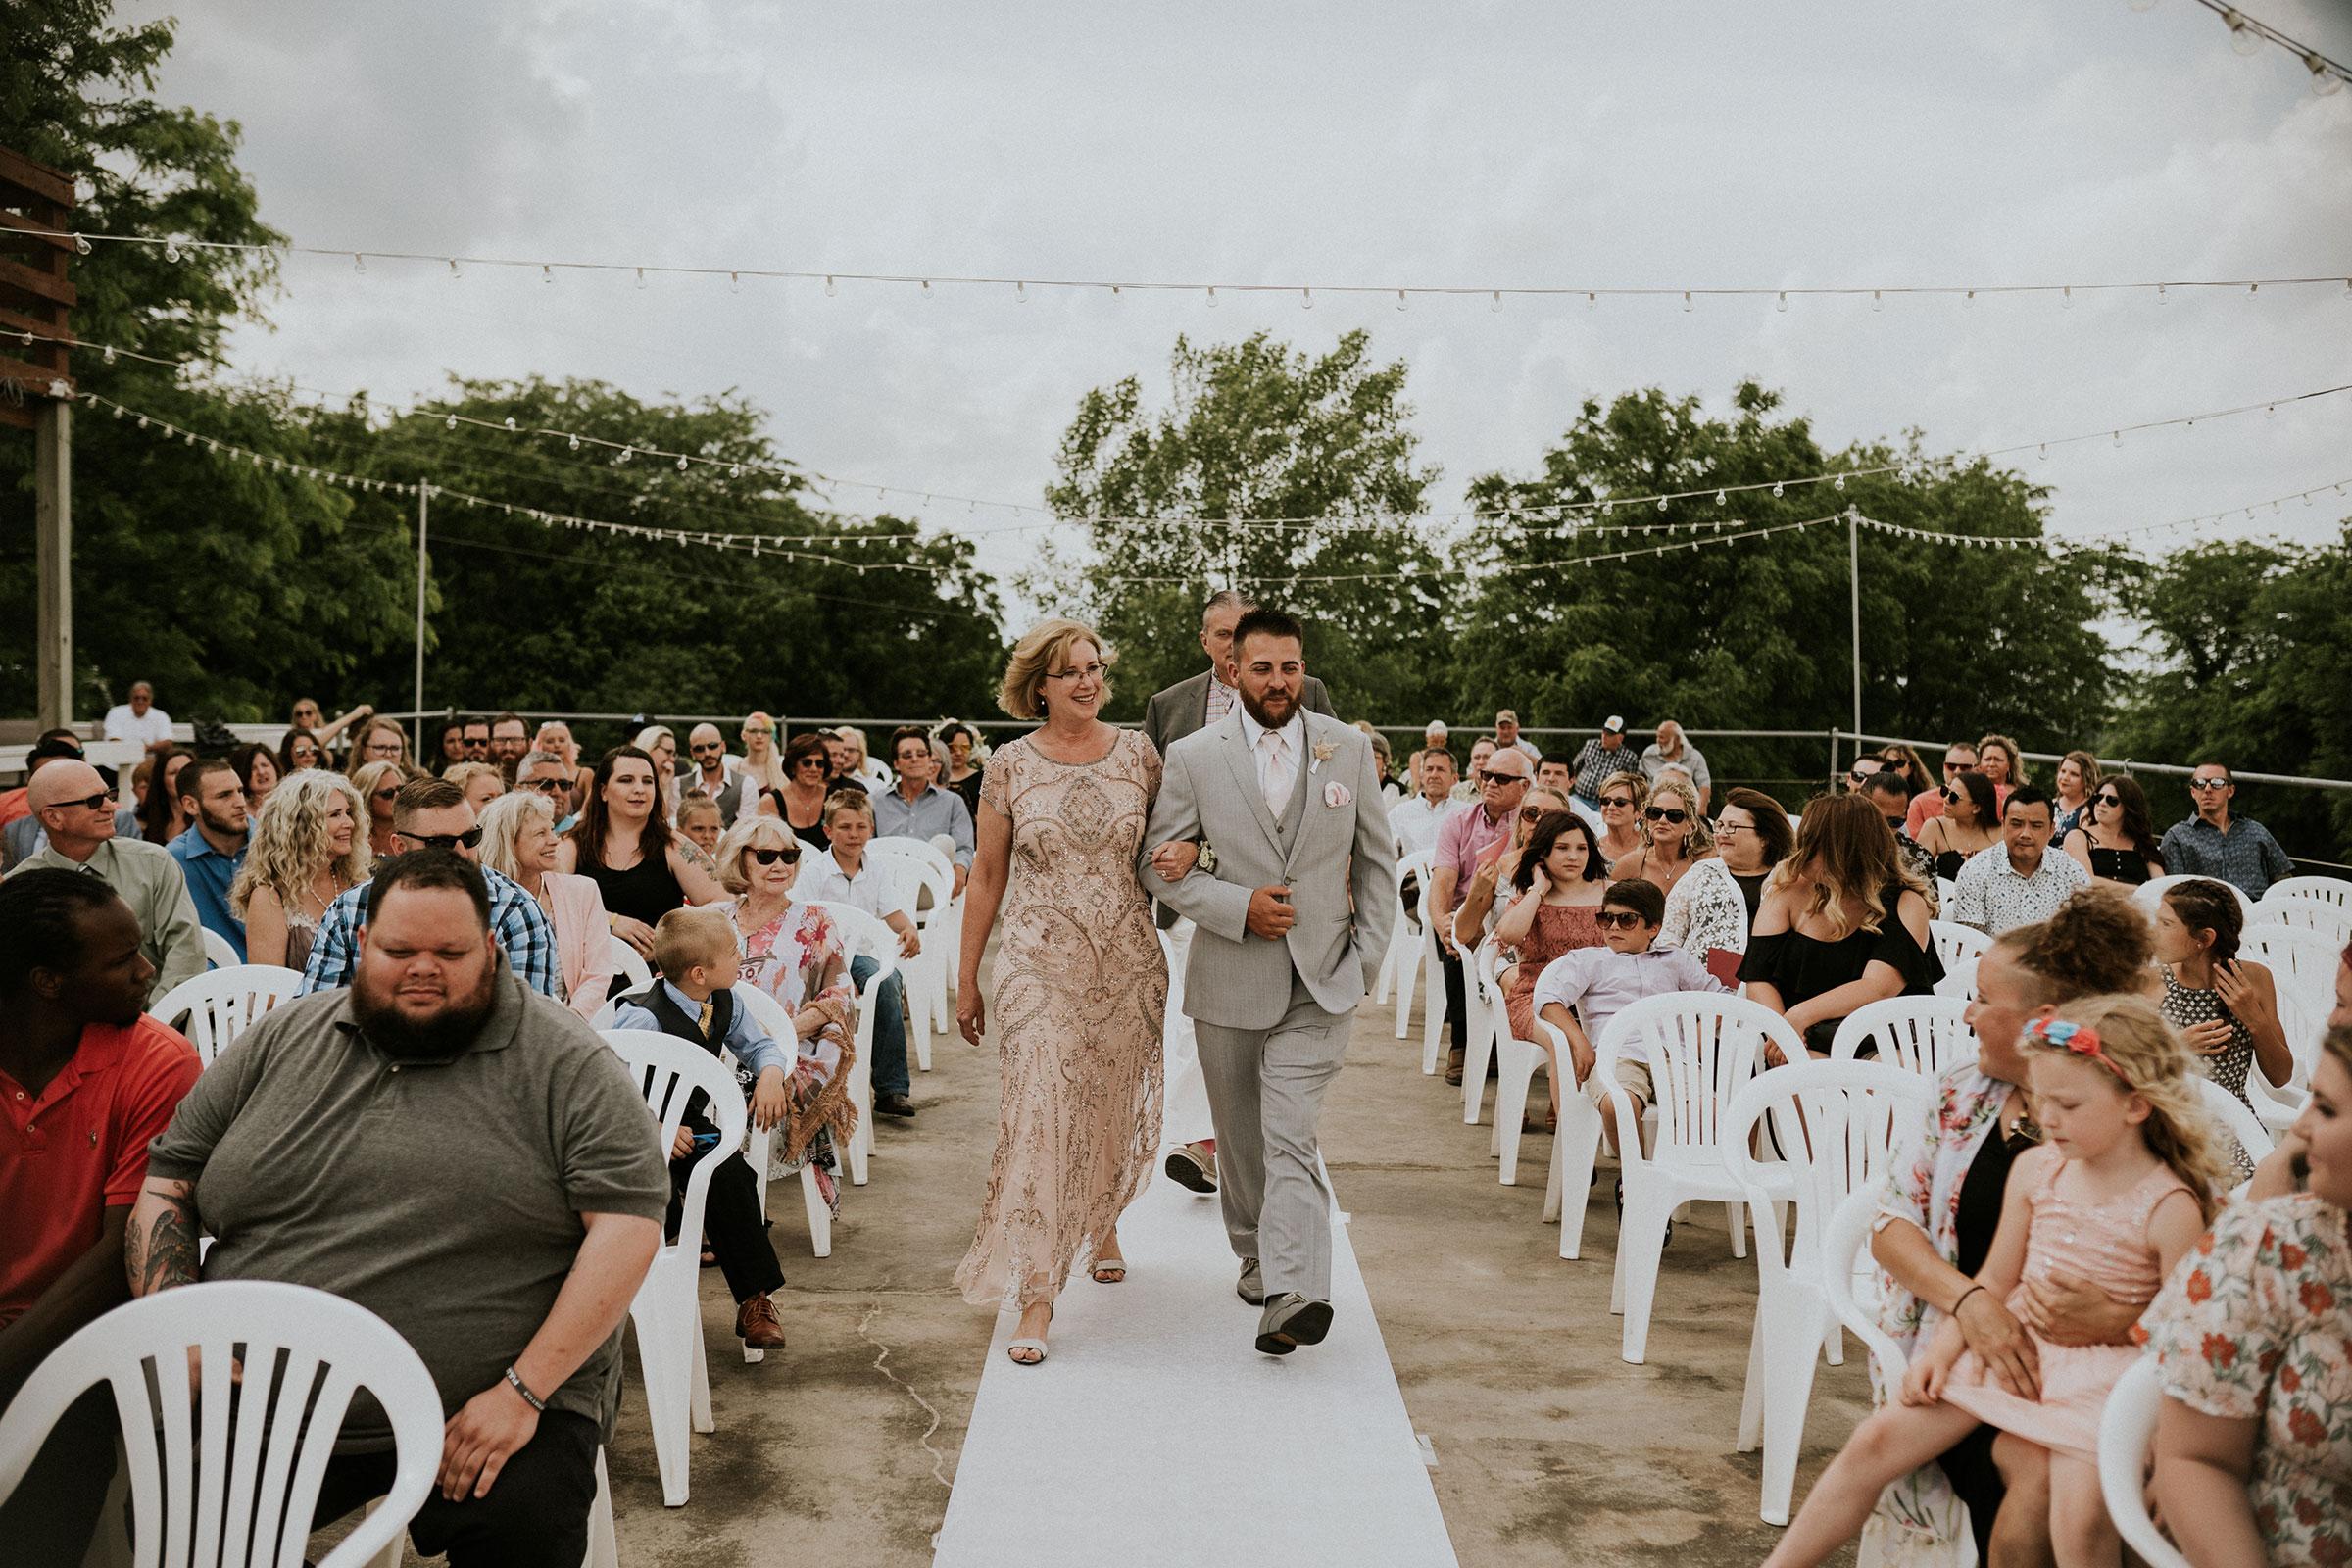 groom-walking-mother-of-bride-down-aisle-wedding-summerset-winery-indianola-iowa-raelyn-ramey-photography.jpg